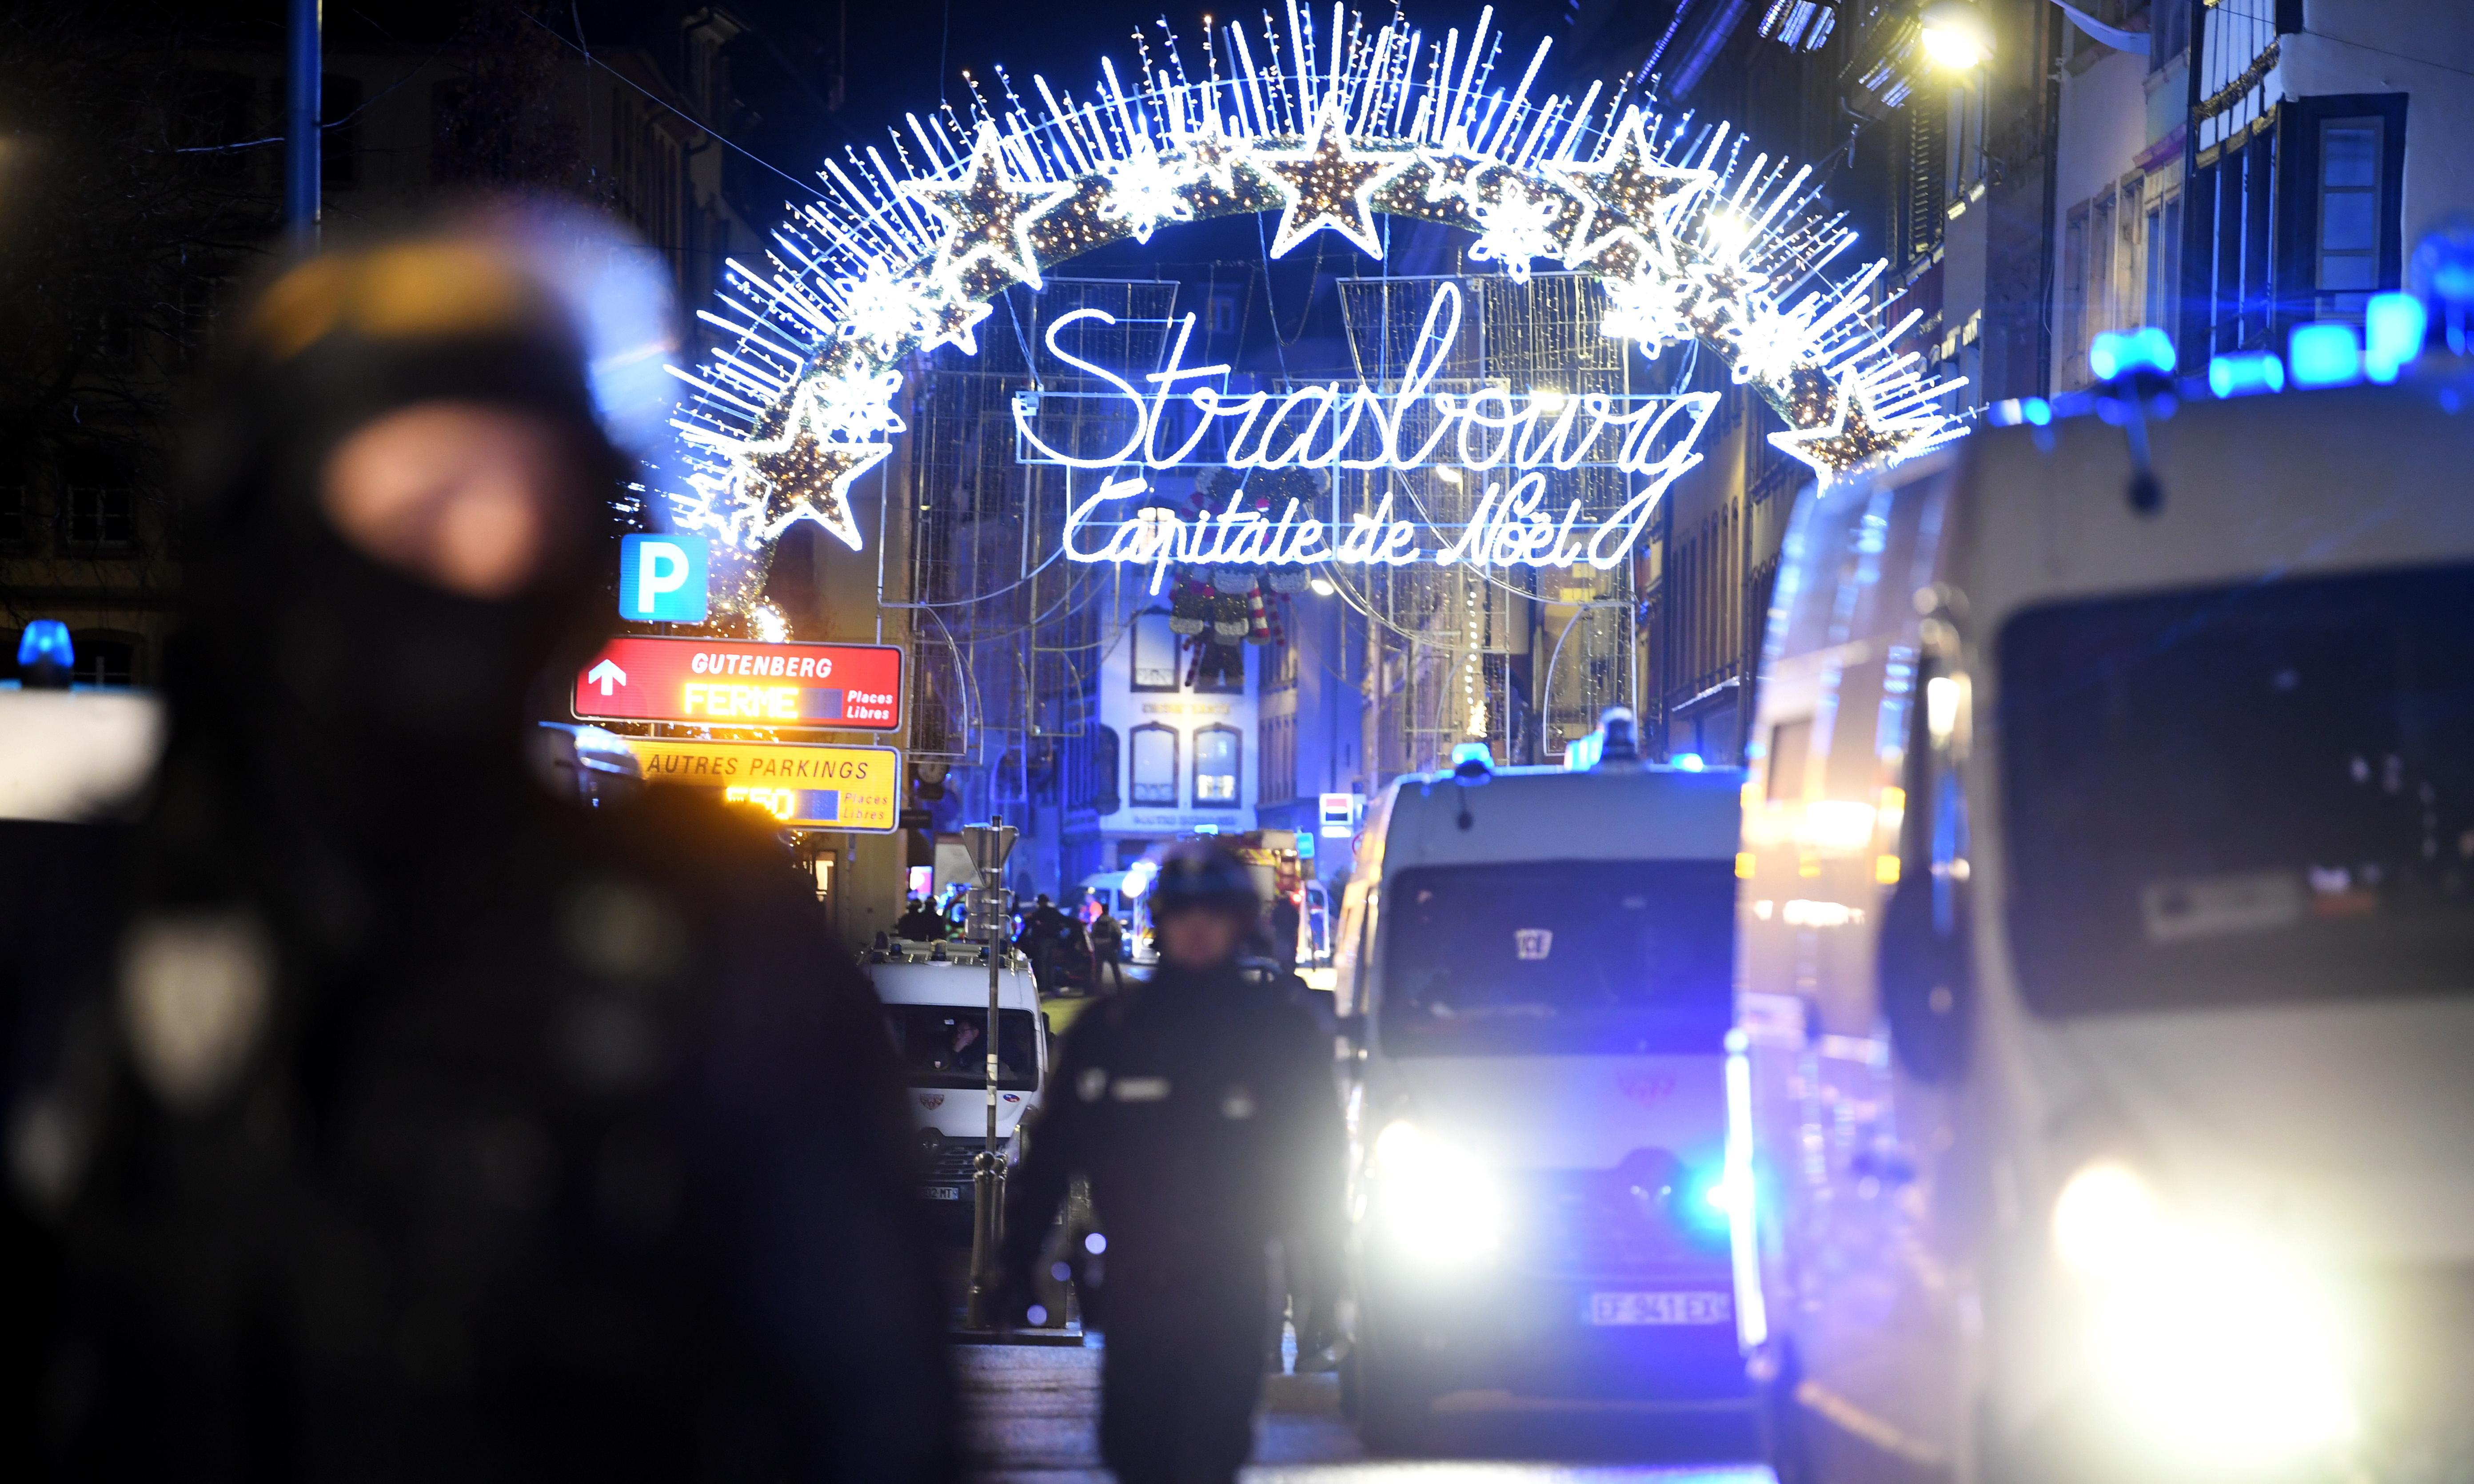 Strasbourg shooting: French and German police hunt gunman